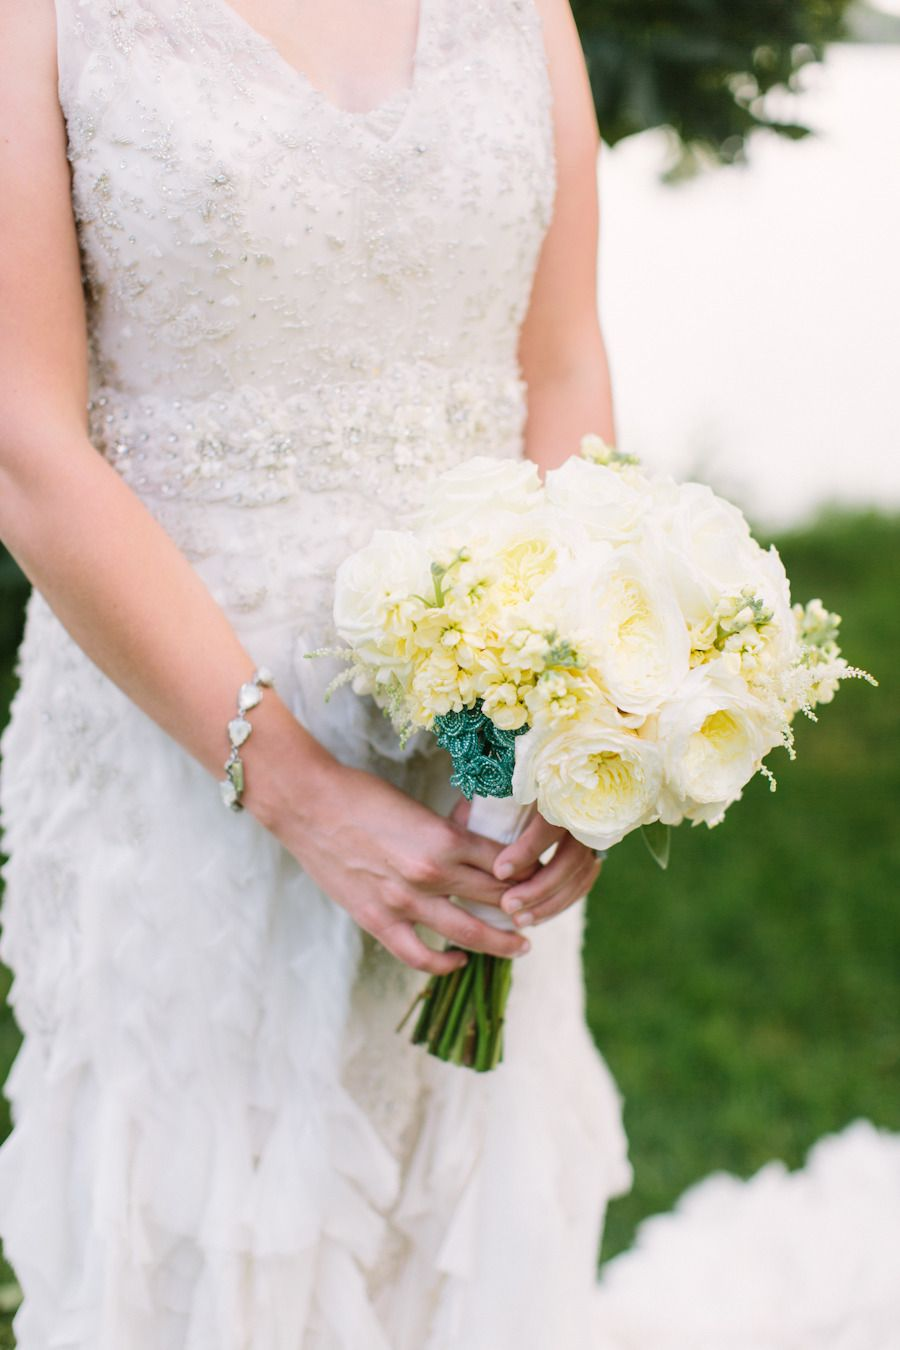 Photography: M Three Studio - mthreestudio.com  Read More: http://www.stylemepretty.com/2014/06/05/lakeside-al-fresco-wedding/